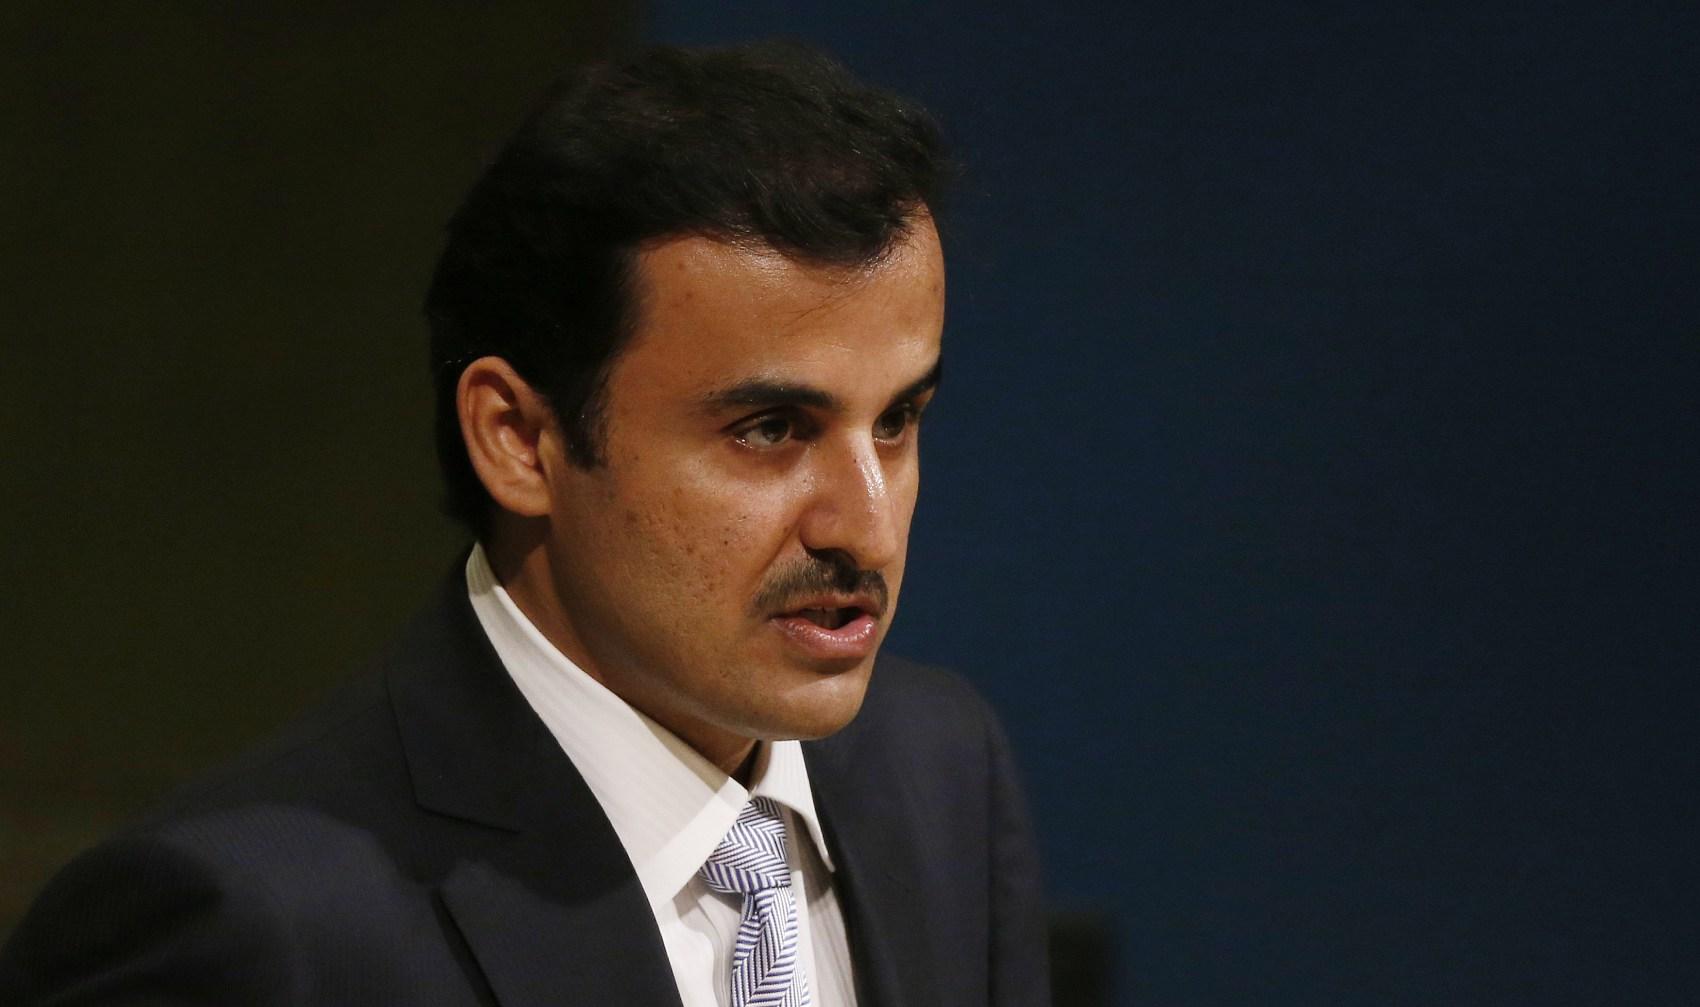 Qatar's emir warns against military action in Gulf dispute